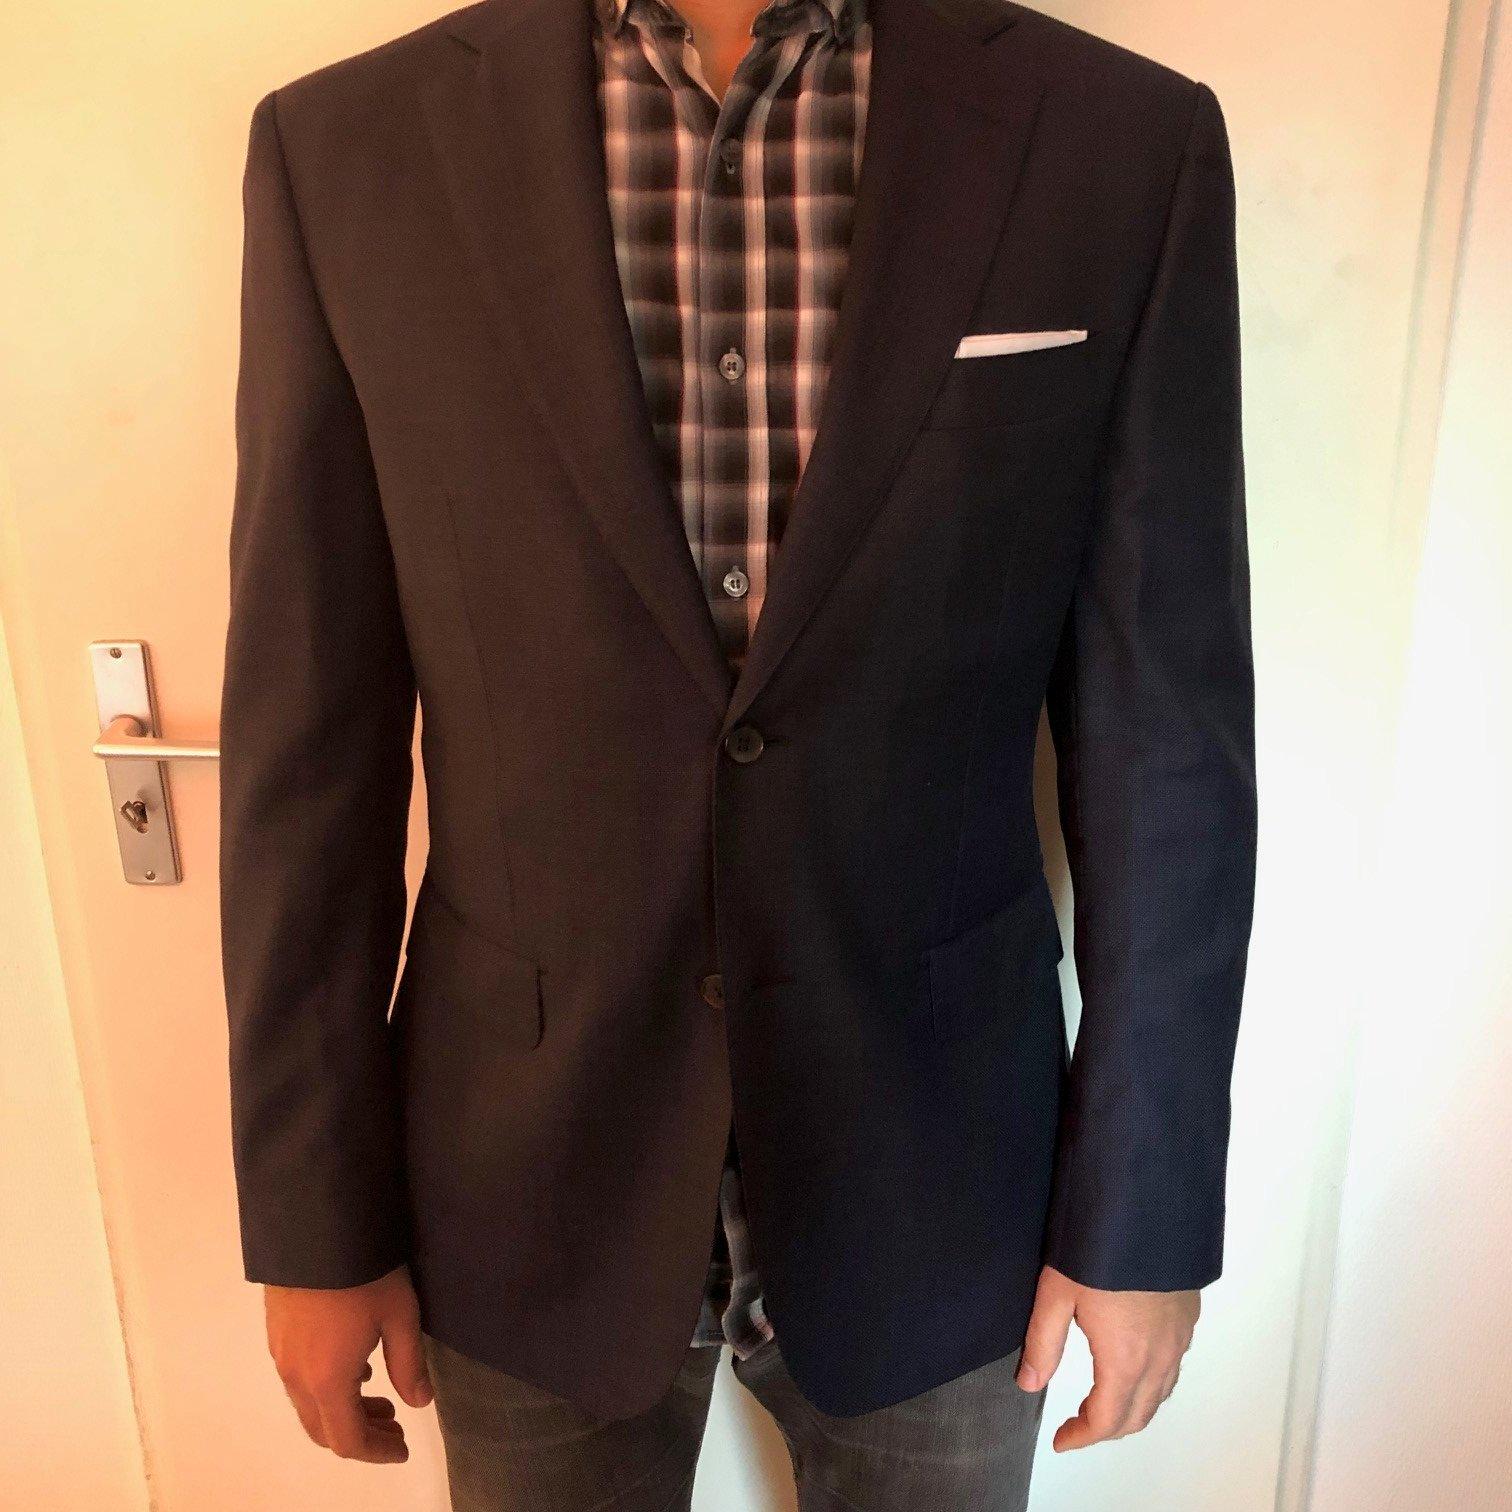 suit 6.jpg